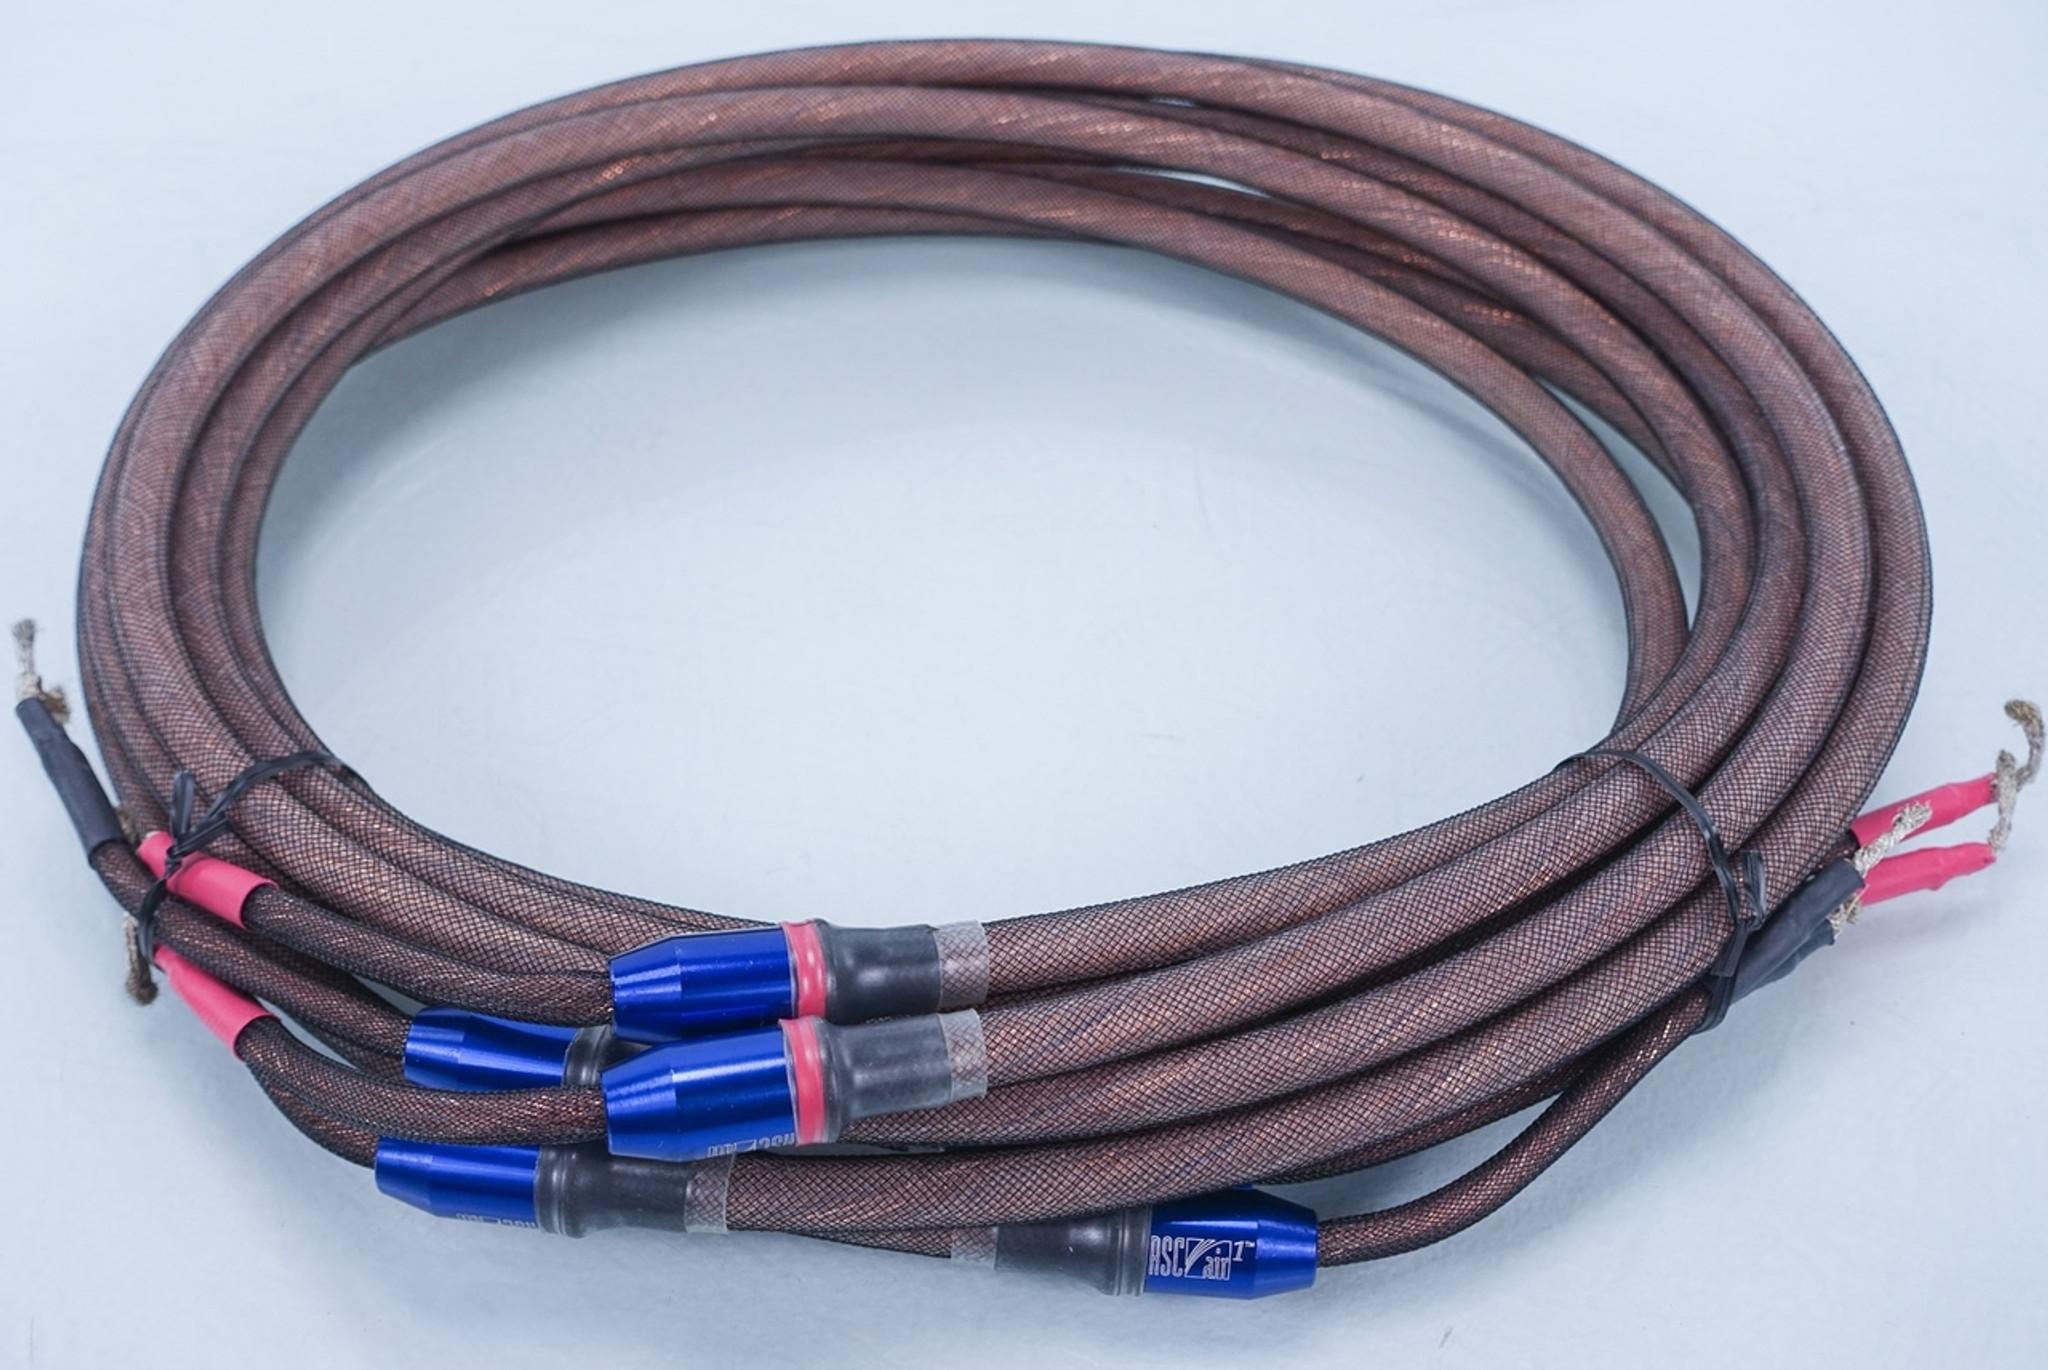 Tara Labs RSC Air 1; 8ft Pair Speaker Cables w/ Soft Pins - The ...